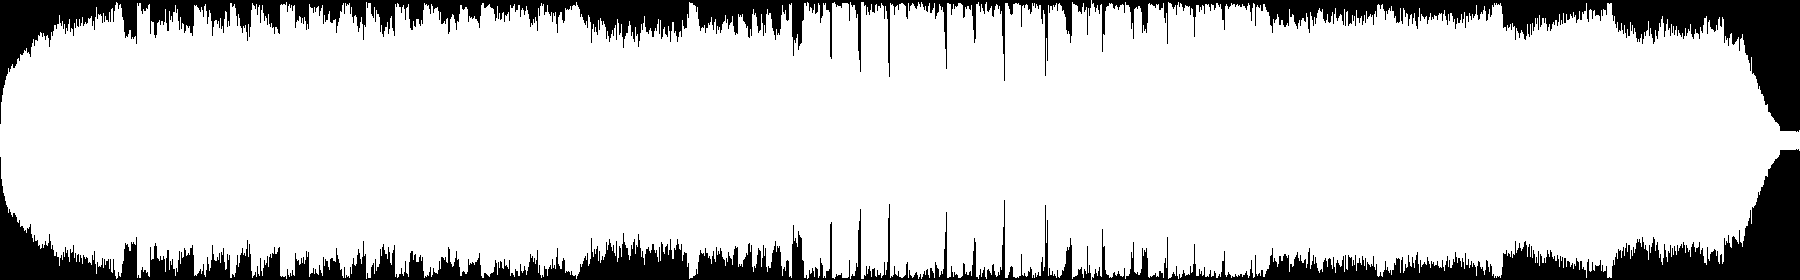 Poztman - Spectral Entities audio waveform